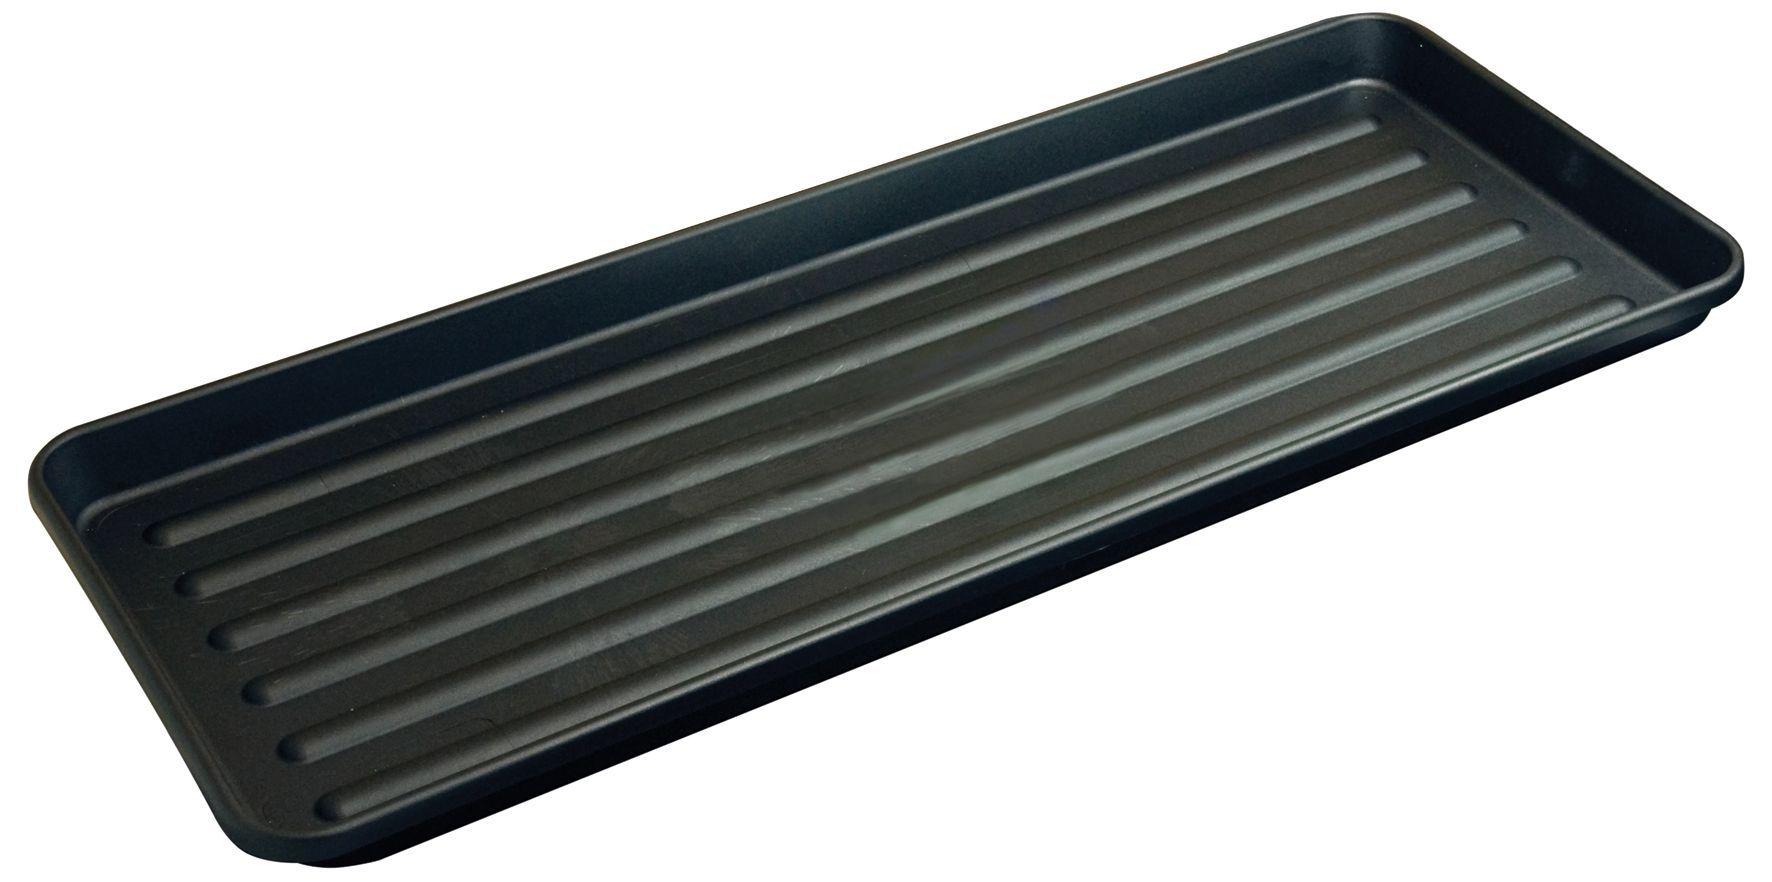 Verve Black Plastic Grow Bag Tray Departments Diy At B 400 x 300